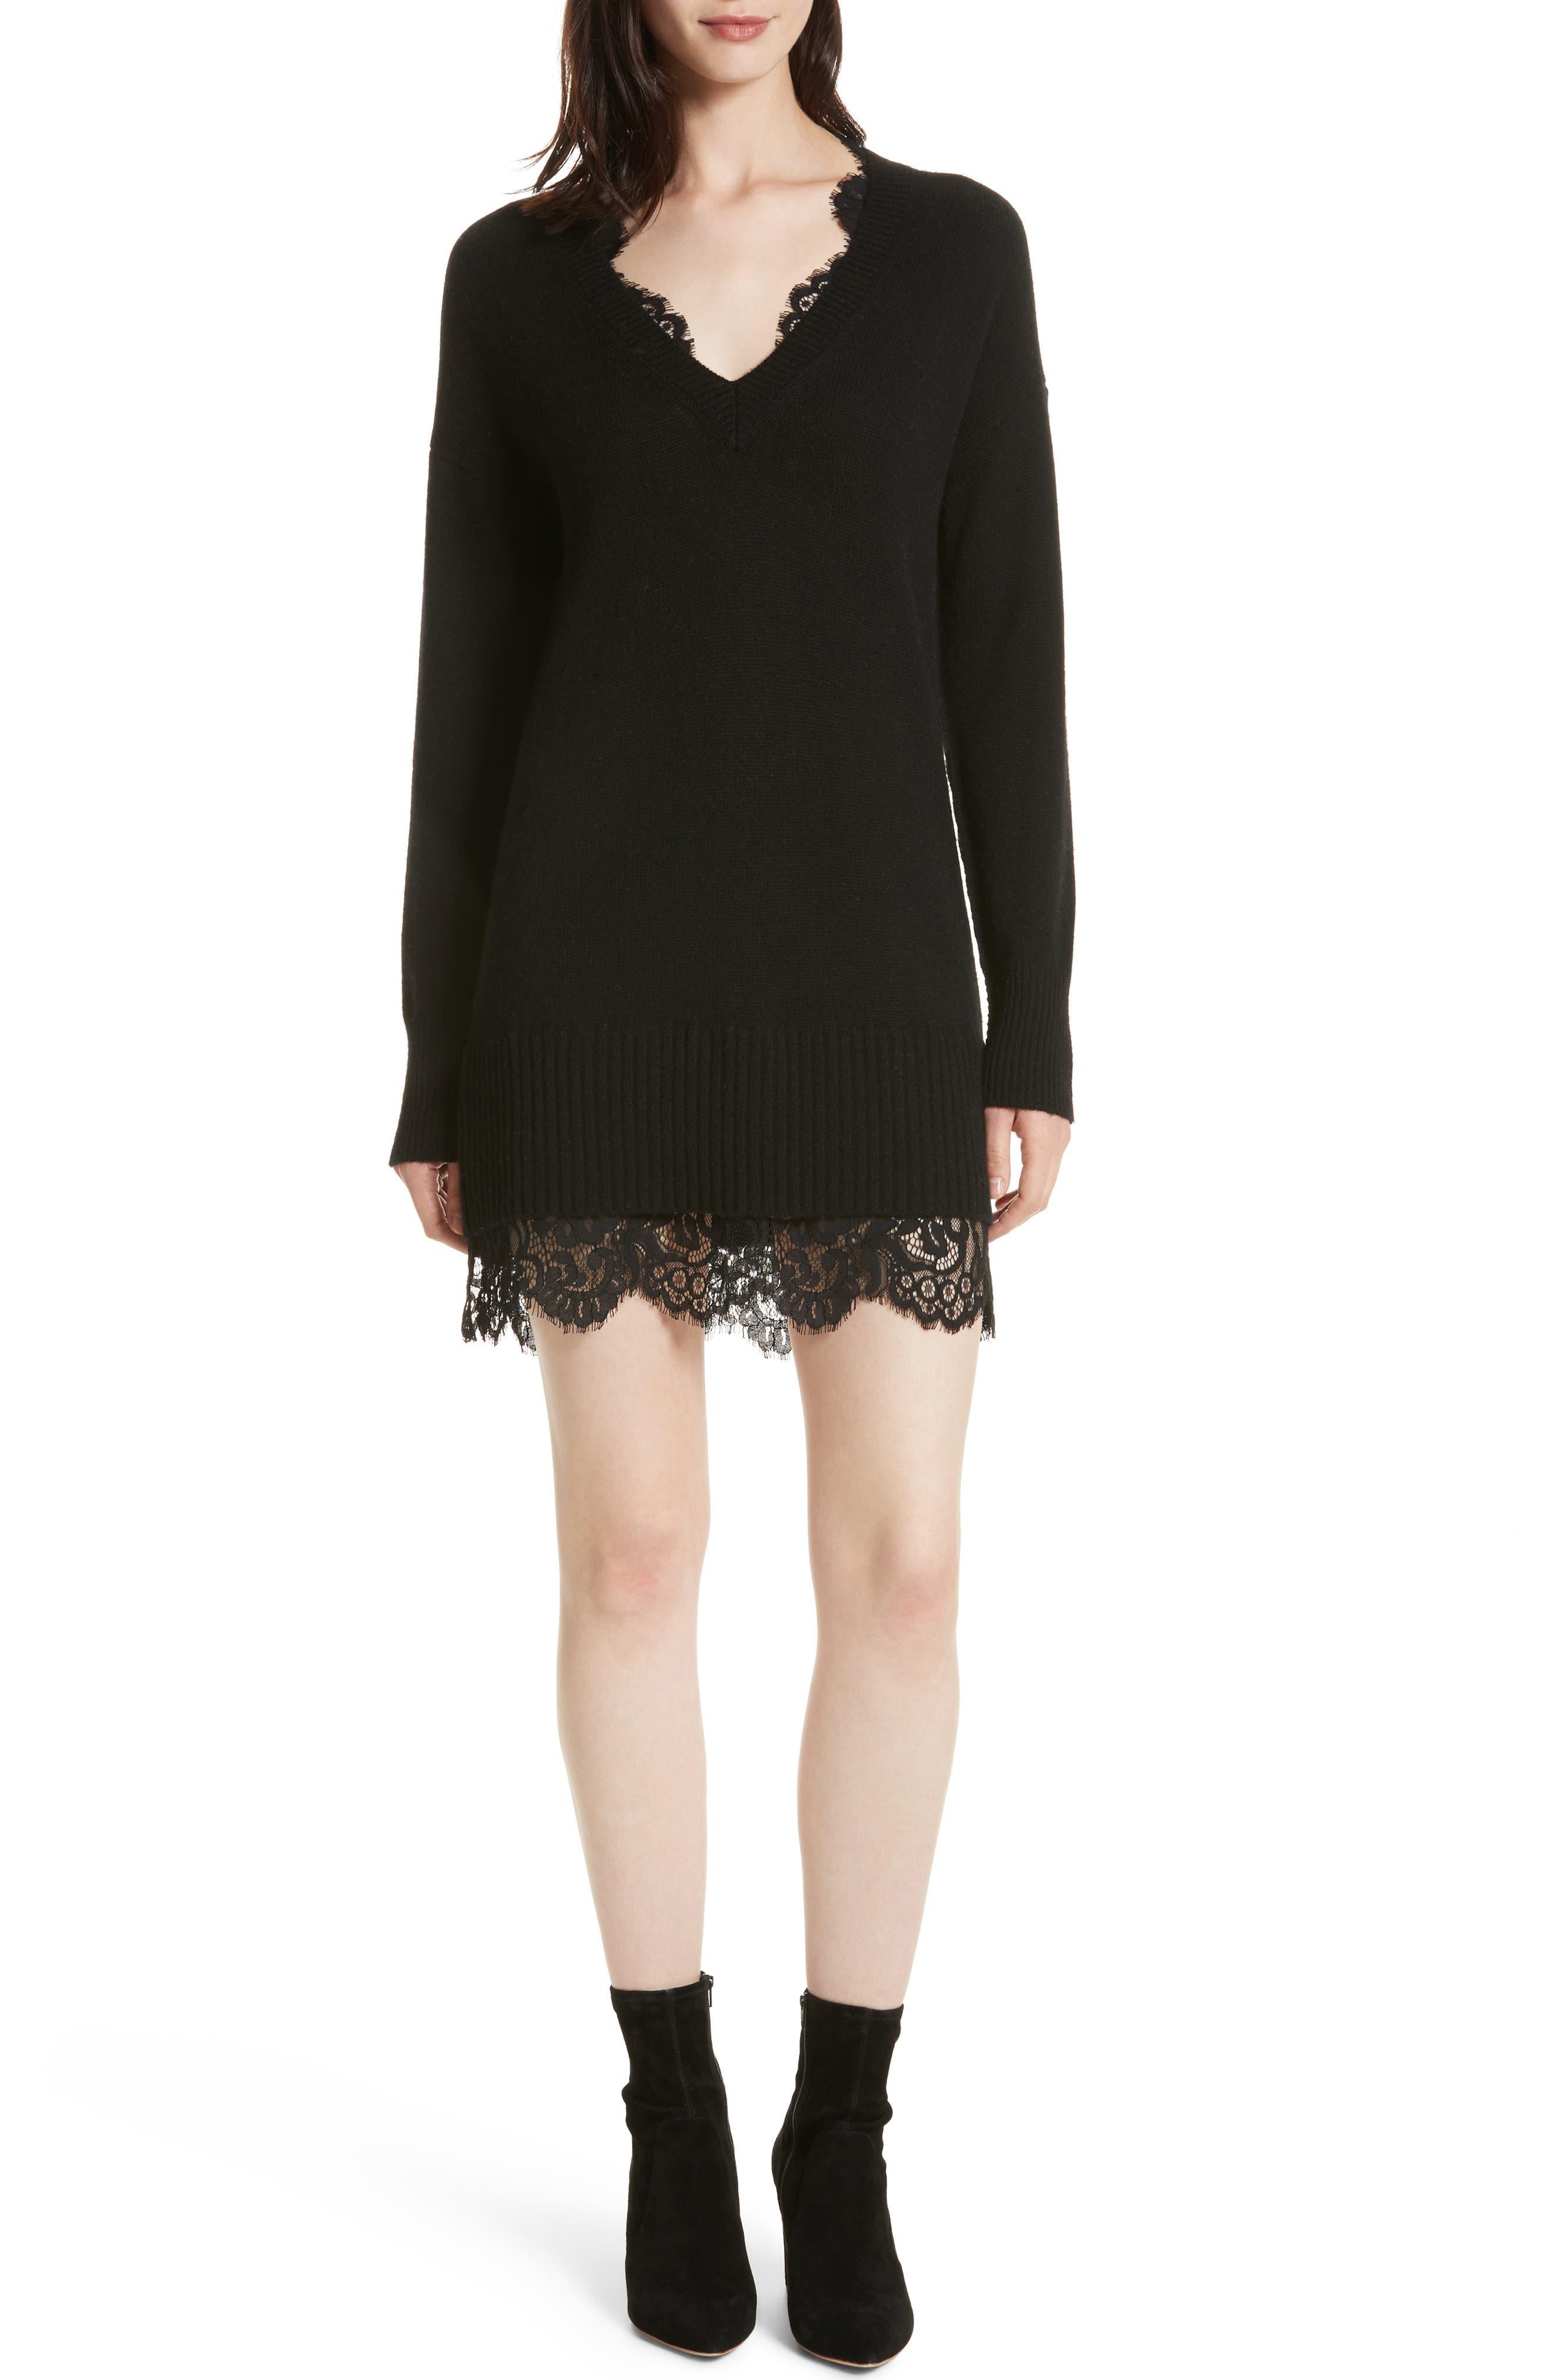 BROCHU WALKER,                             Lace Looker Sweater Dress,                             Main thumbnail 1, color,                             001